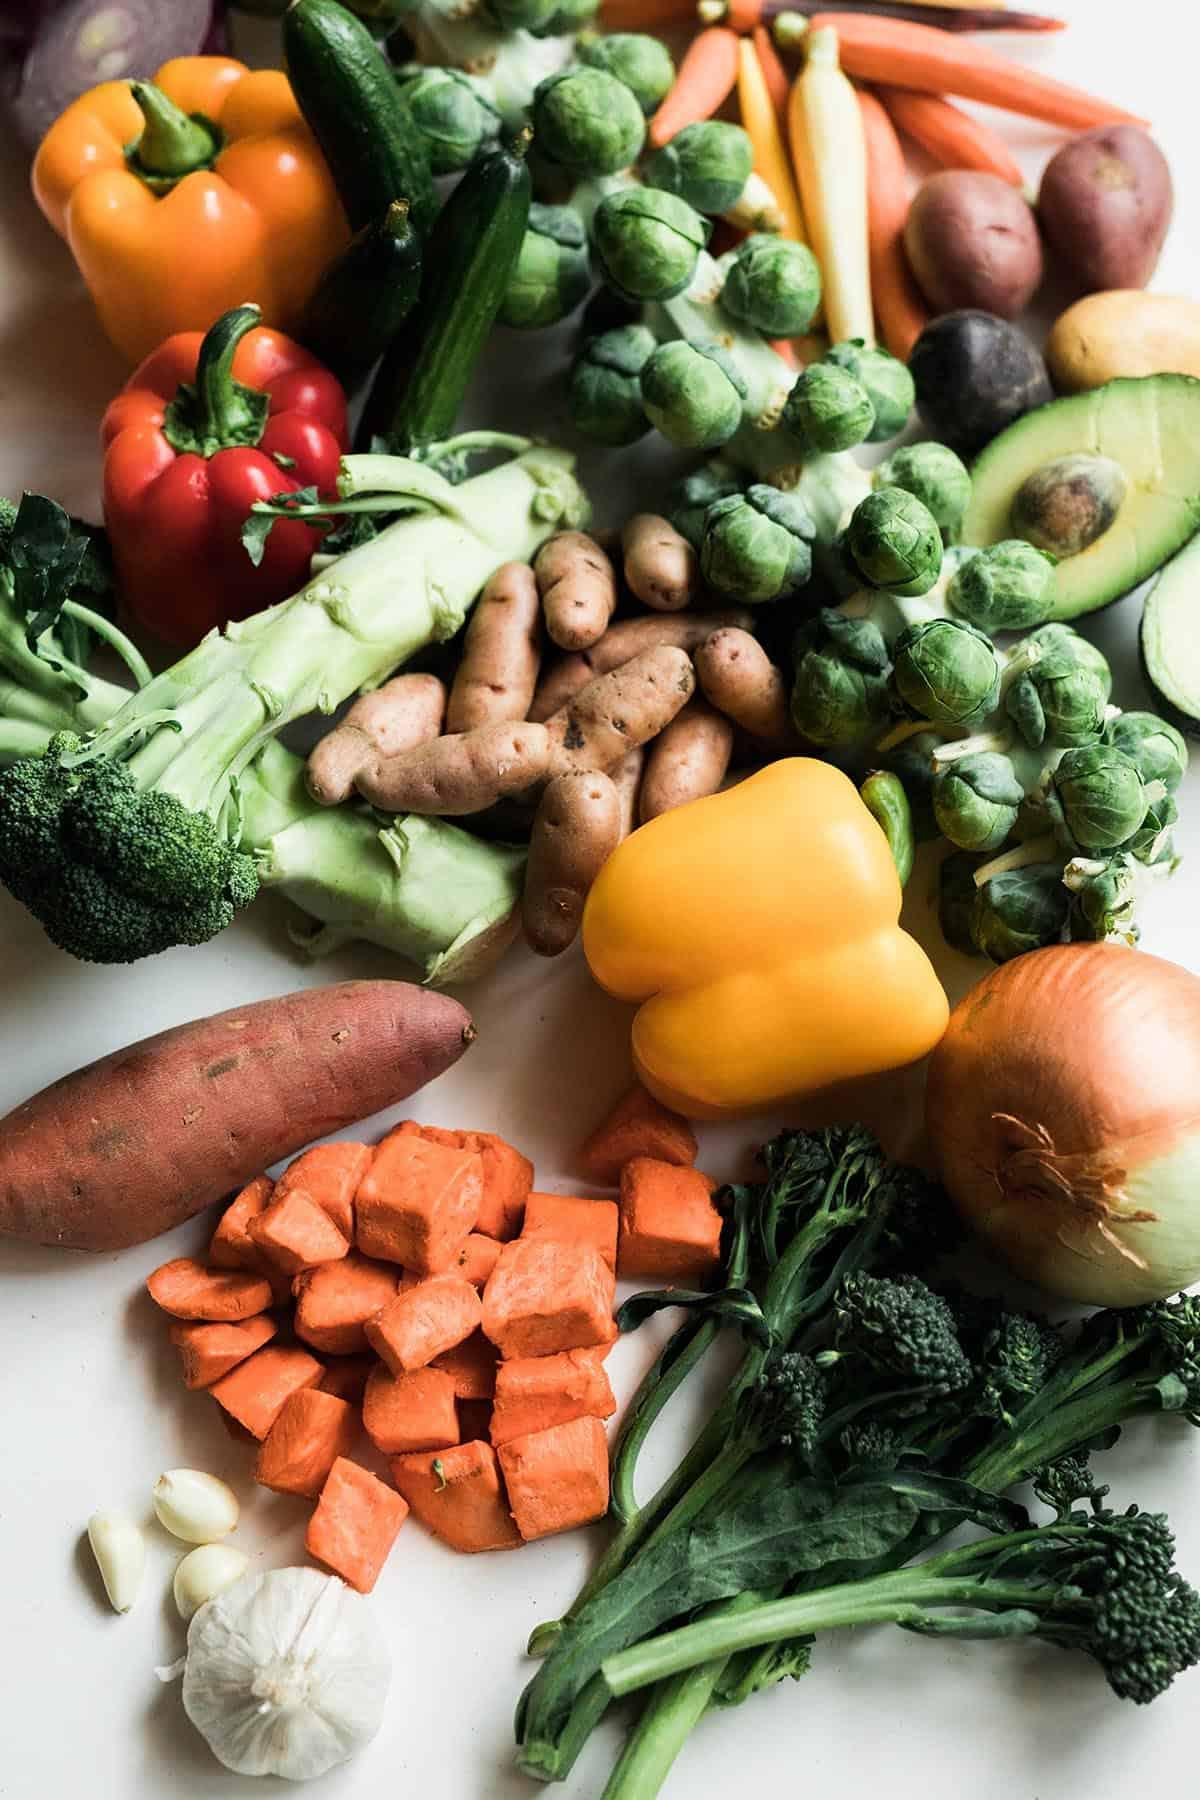 vegetables that vegans eat